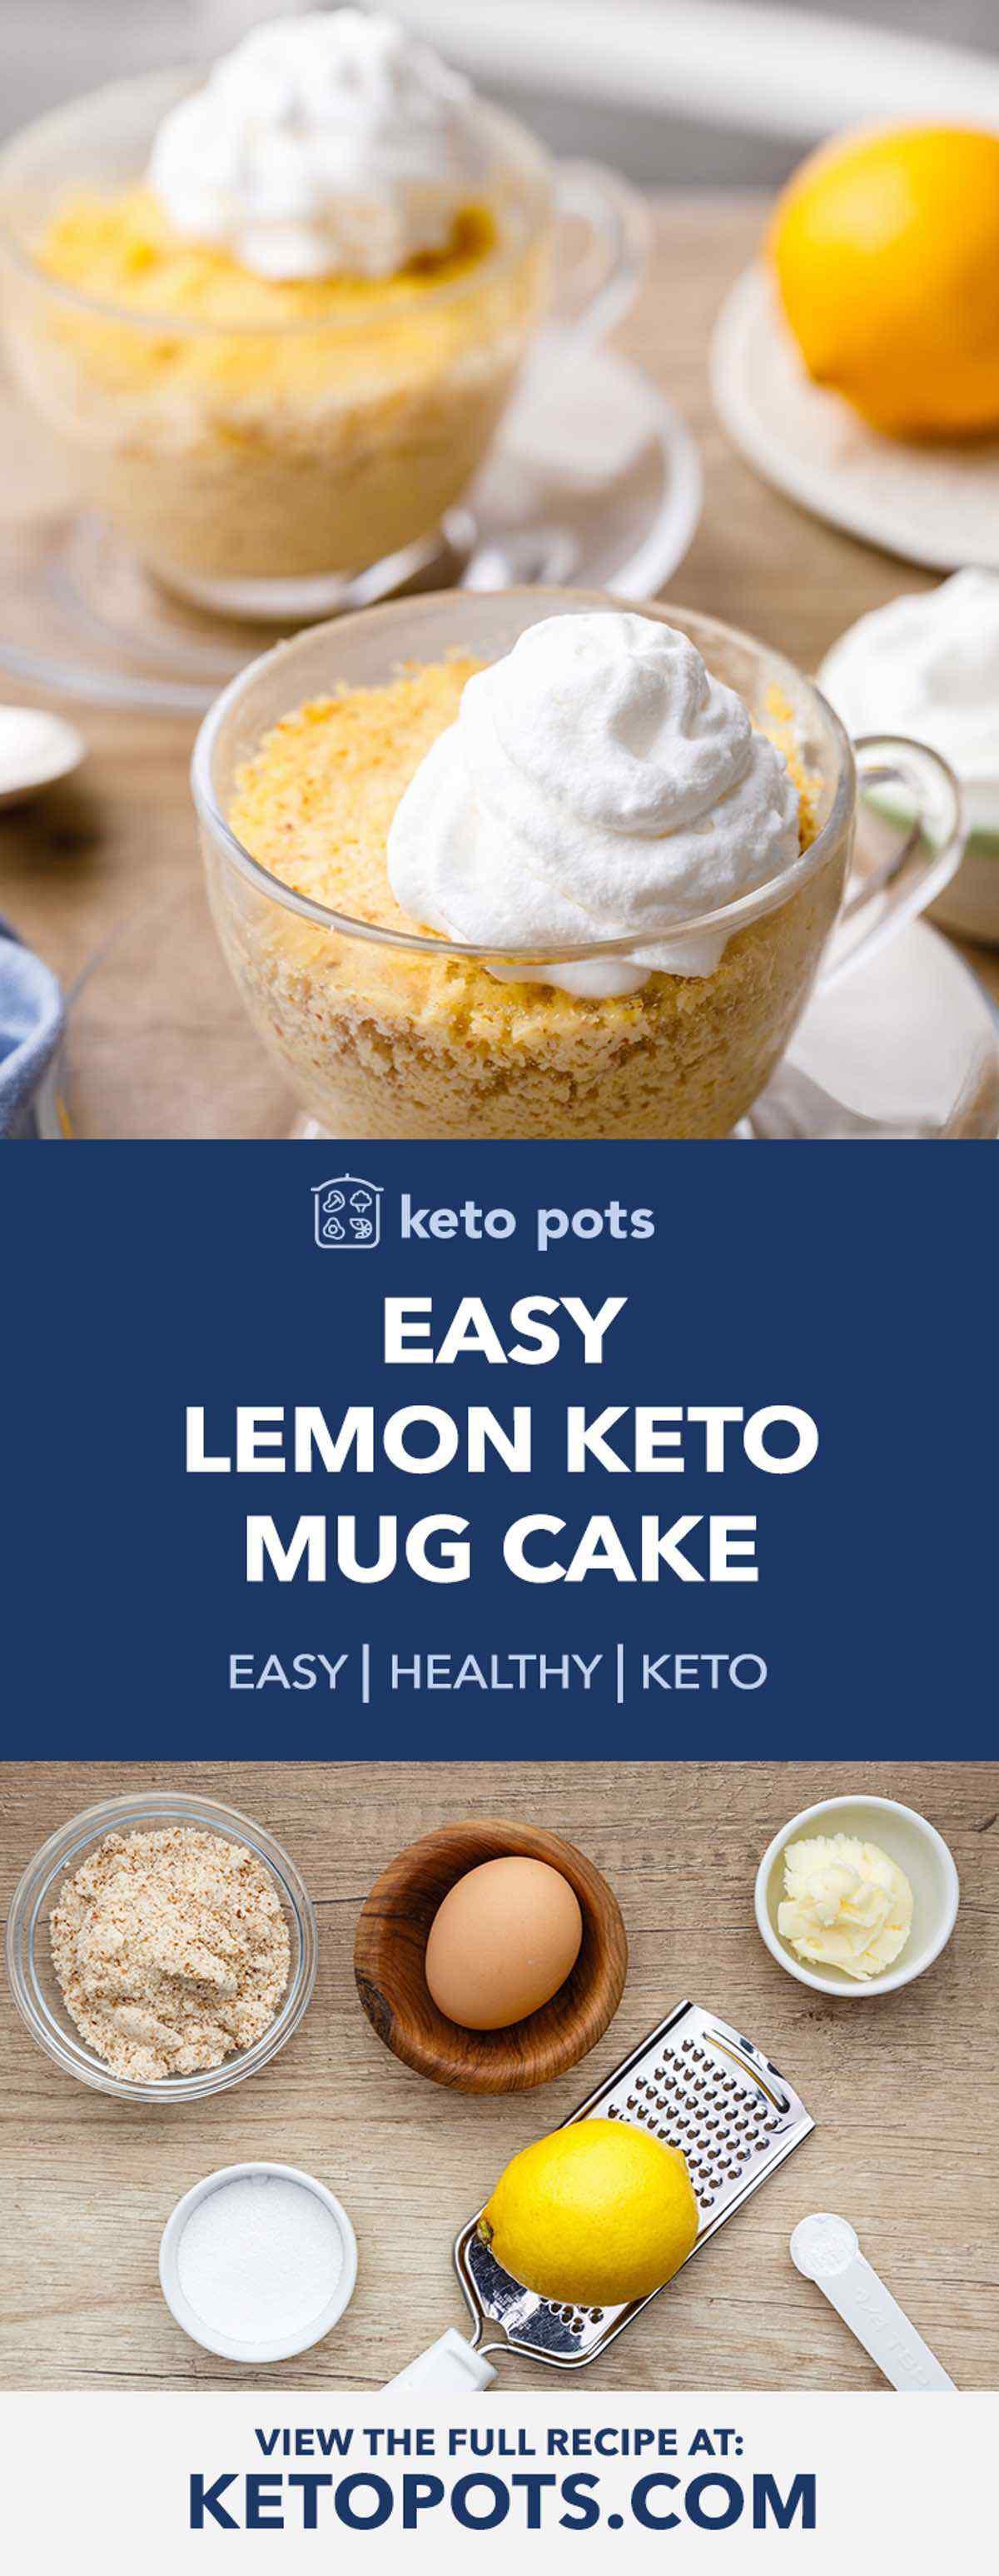 Out Of This World Keto Myer Lemon Mug Cake Keto Pots